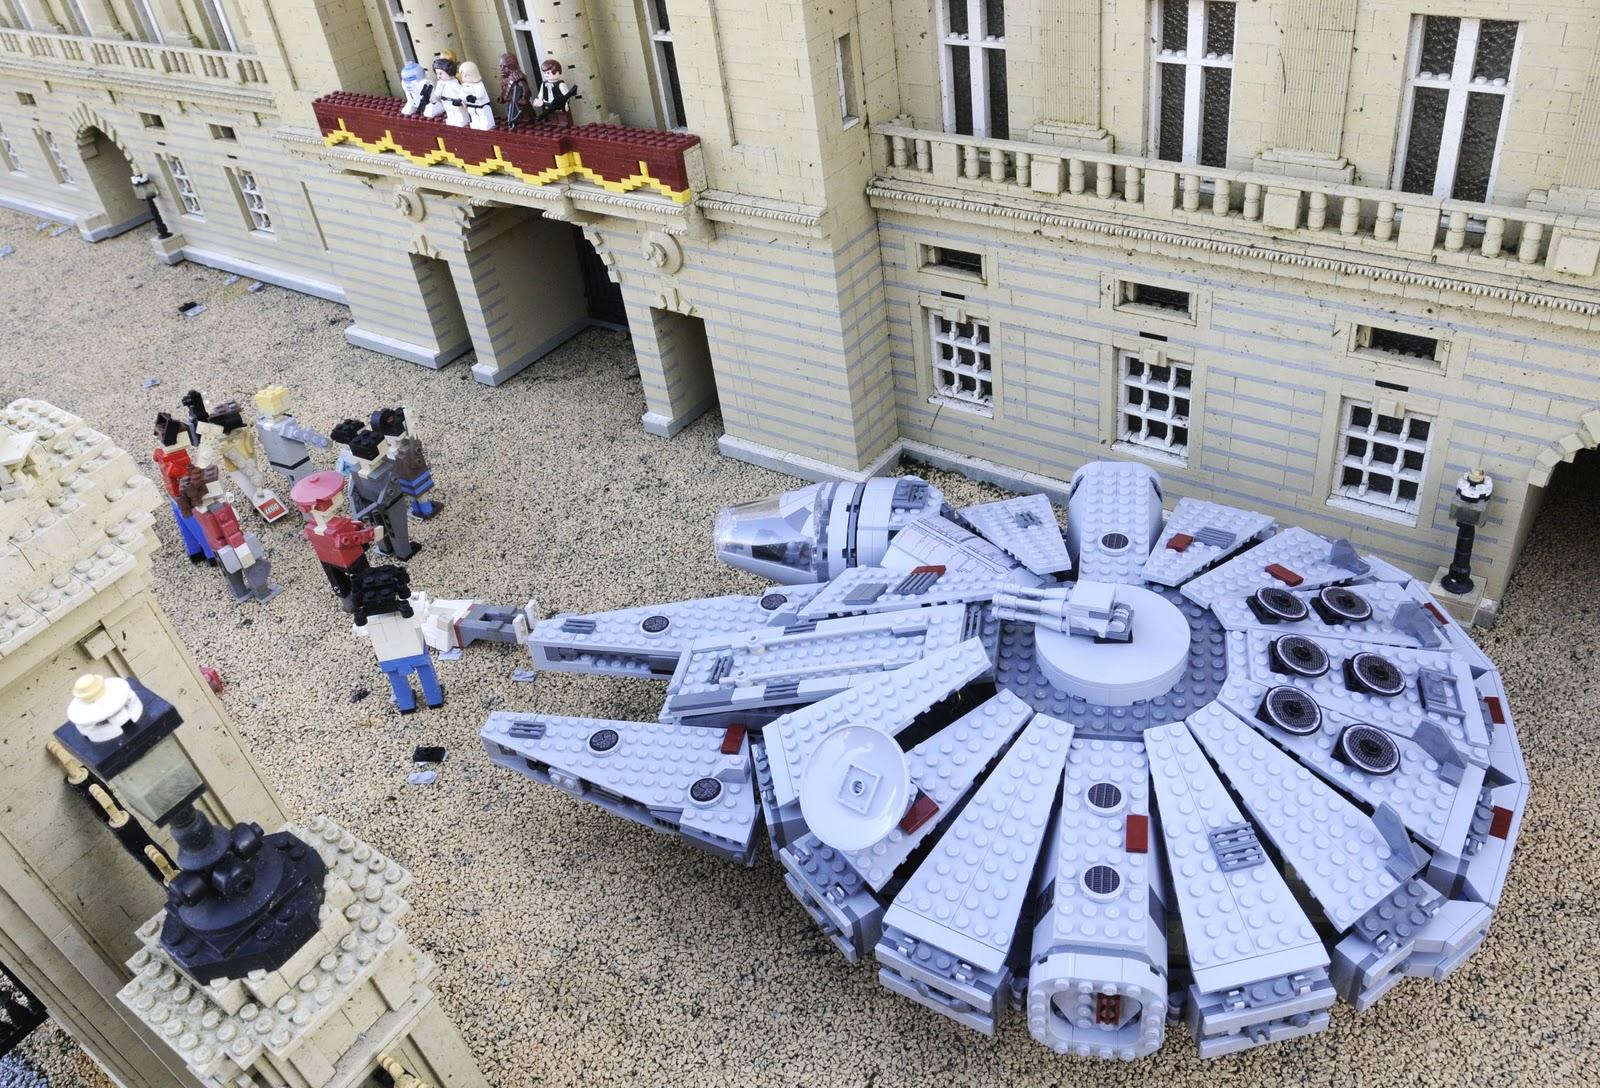 All About Bricks: Star Wars is invading LEGOLAND Windsor